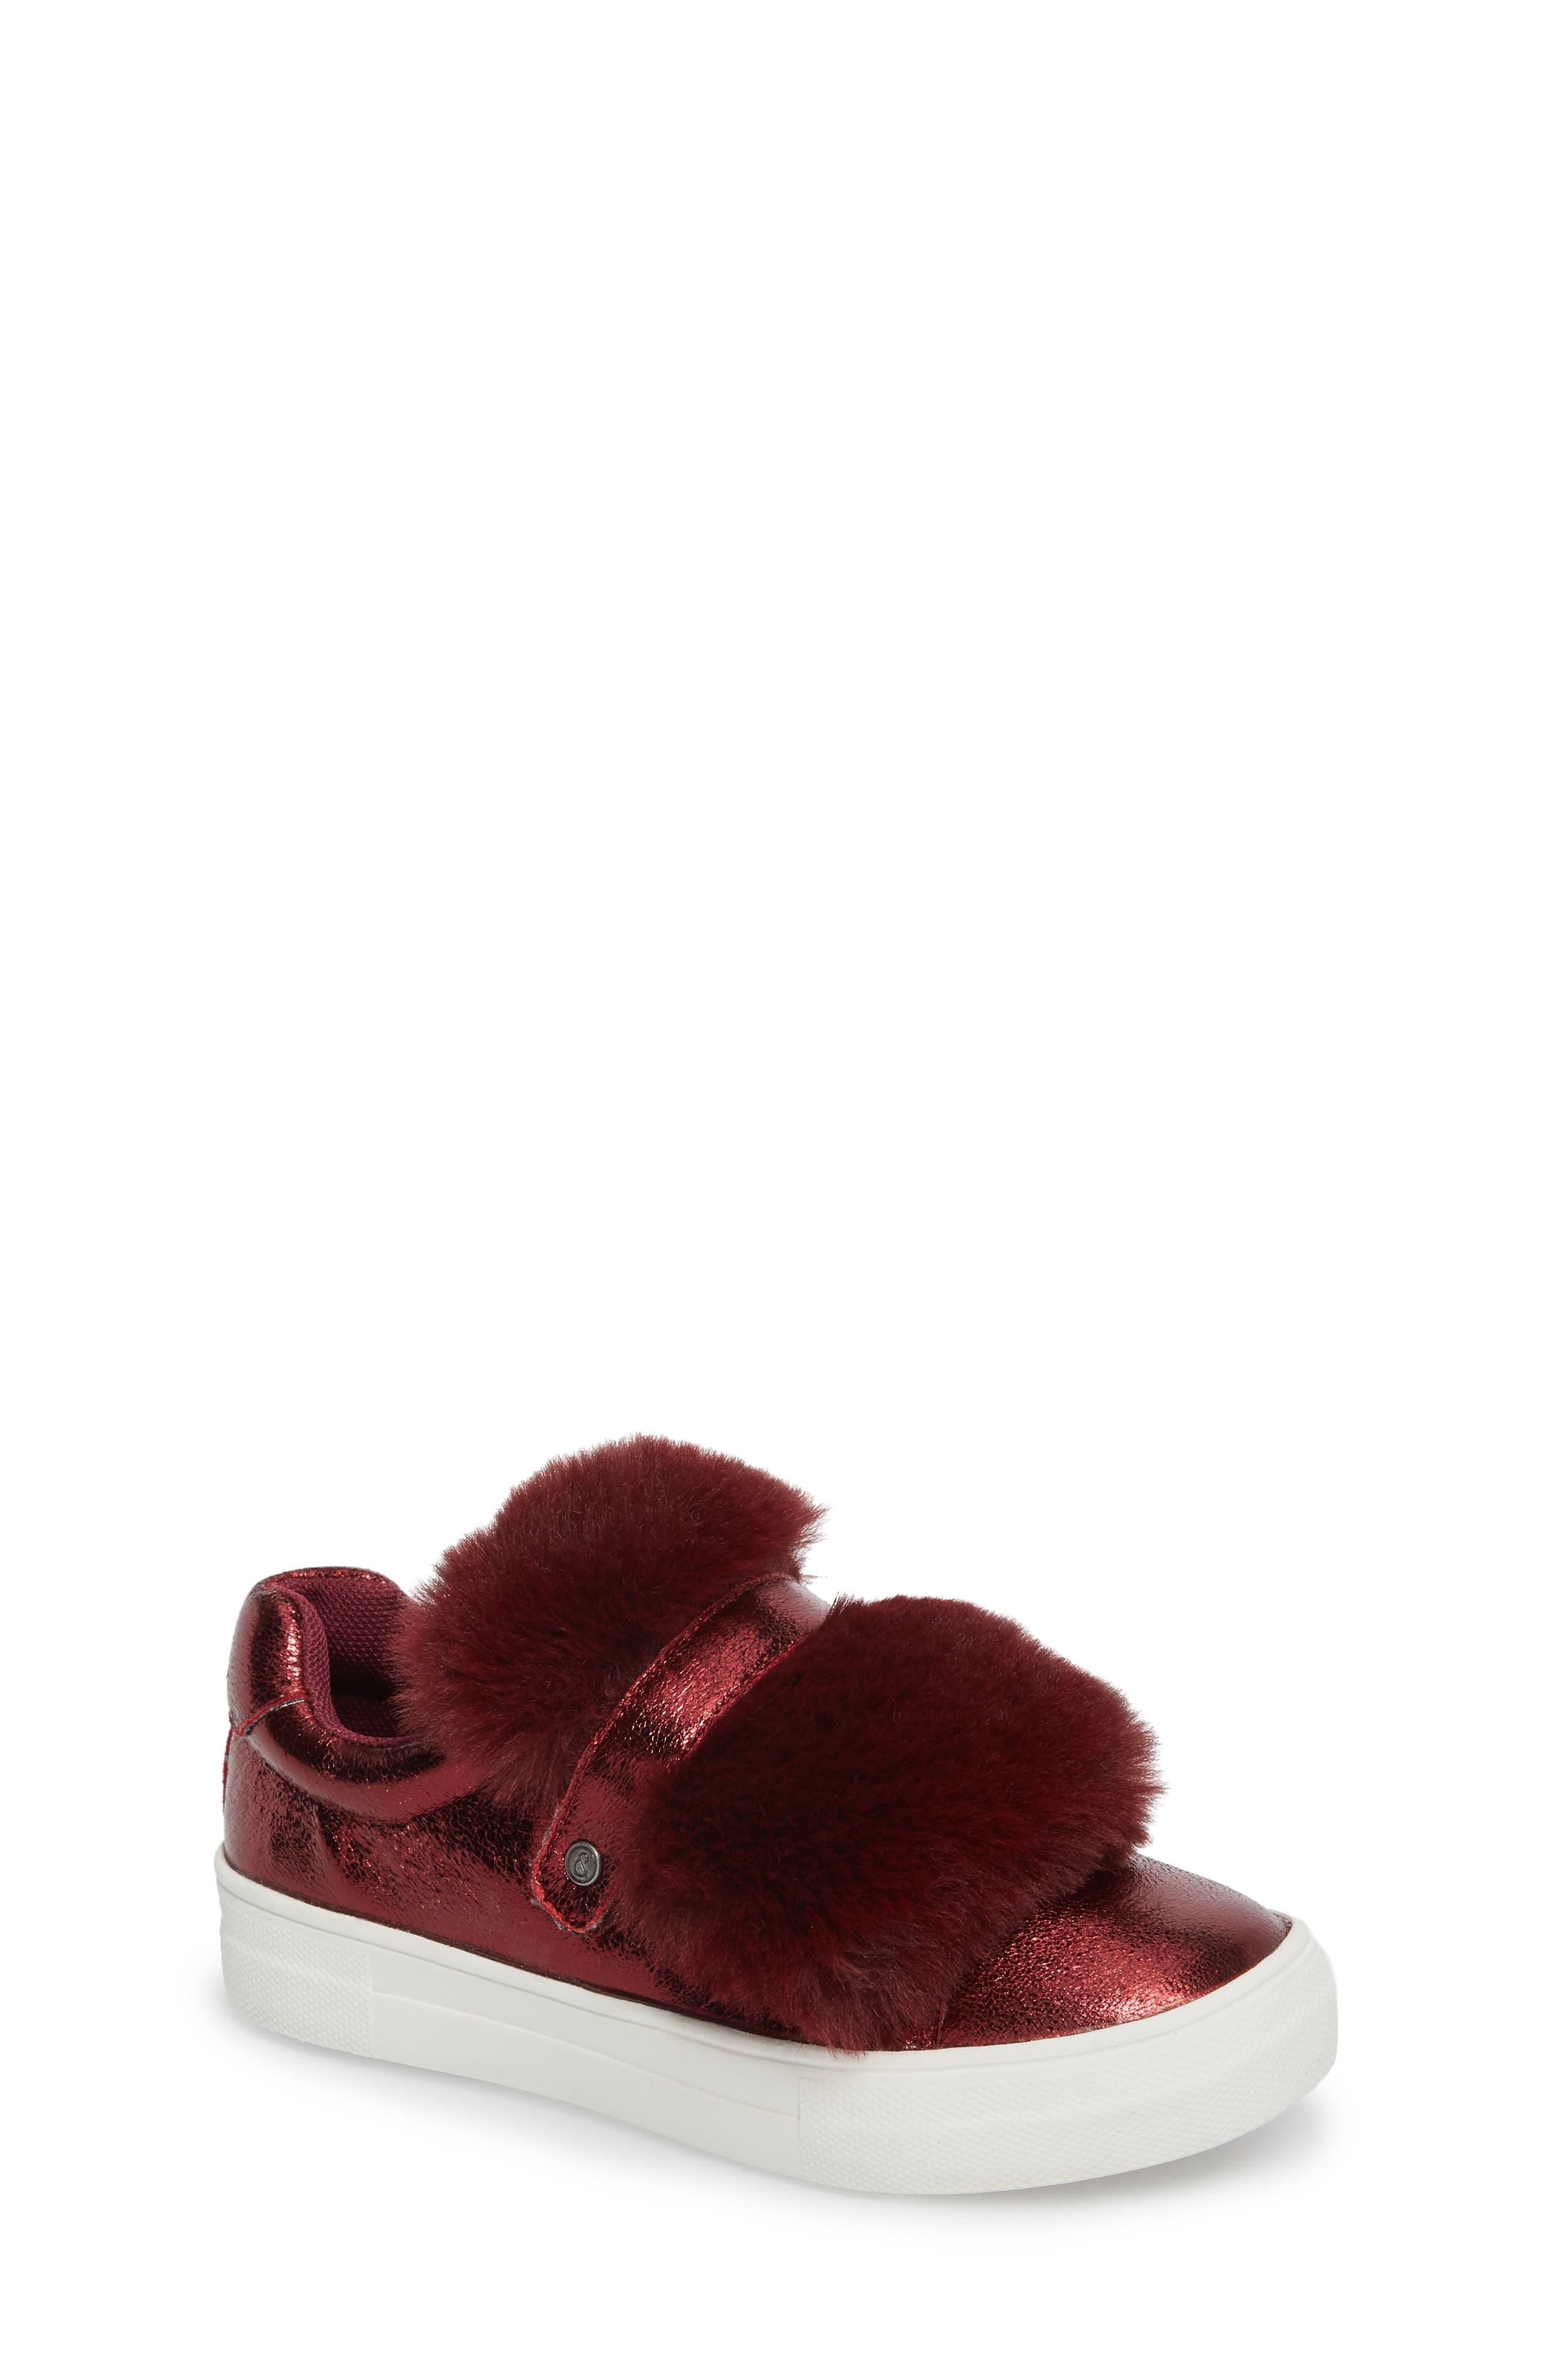 Zandra Faux Fur Metallic Sneaker,                             Main thumbnail 1, color,